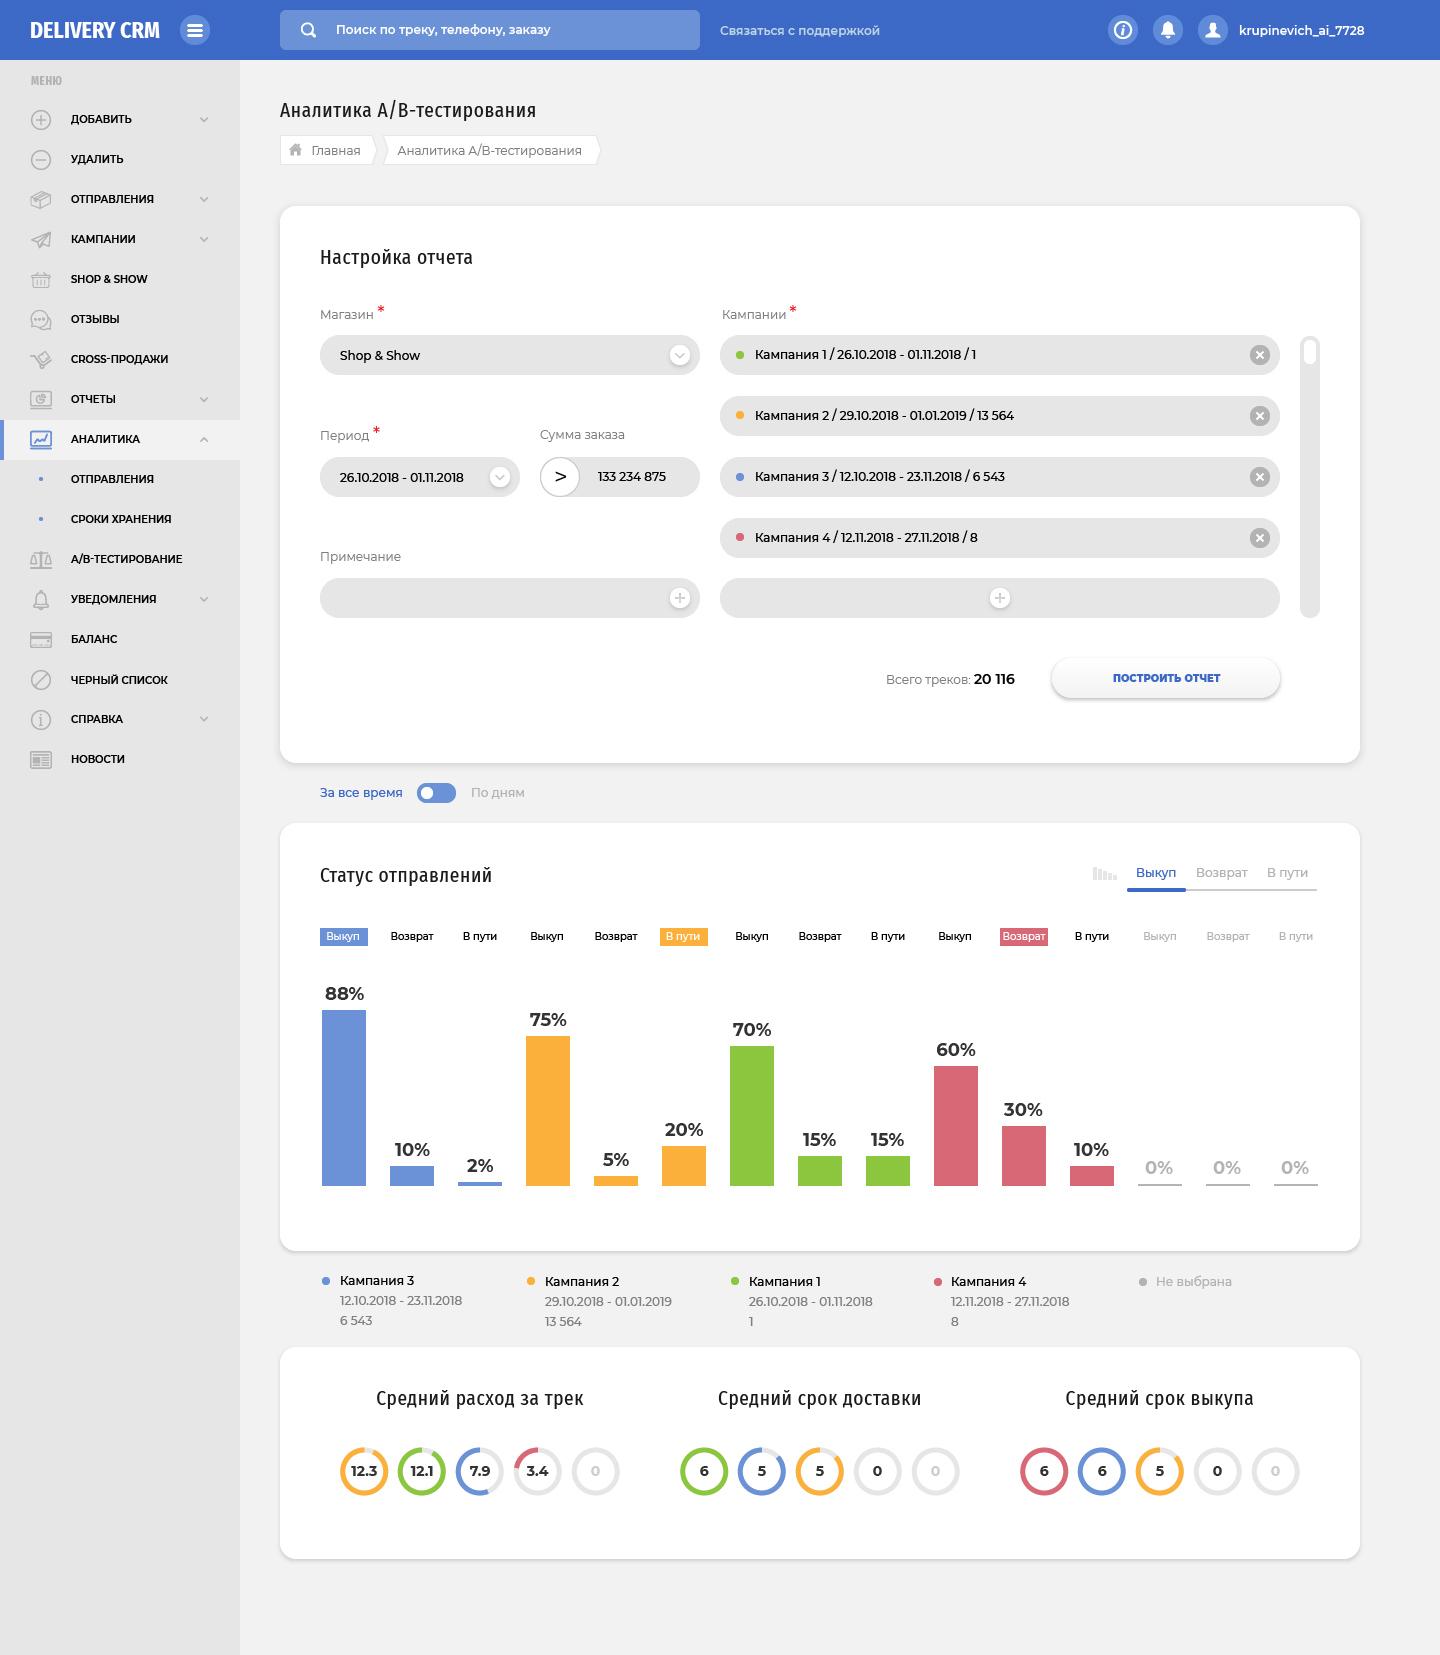 Дизайн страницы аналитики в ЛК Saas сервиса для e-com фото f_5805c05973d26807.jpg